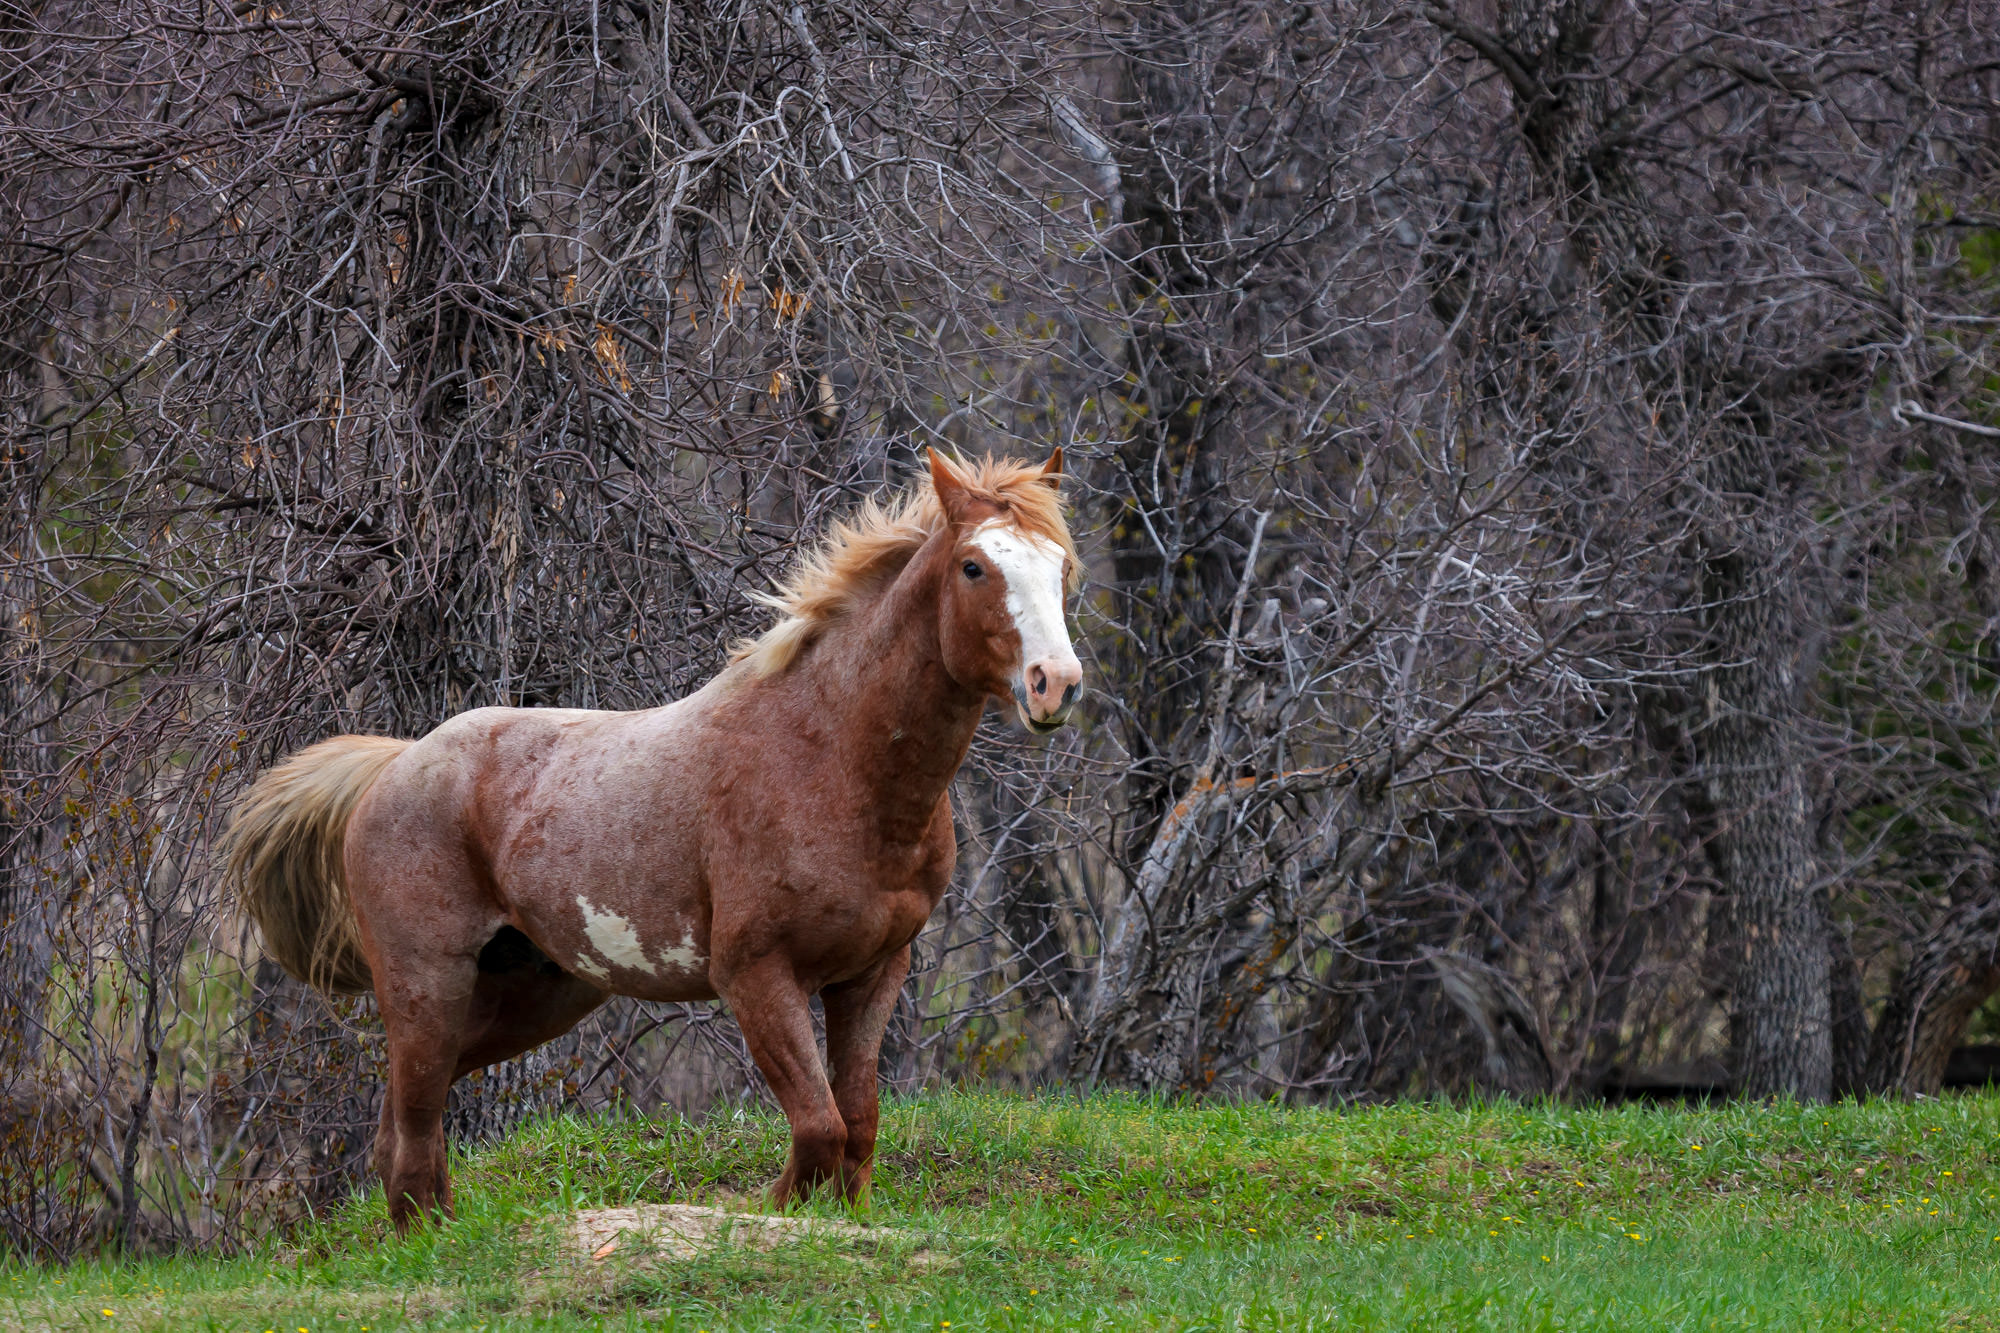 North Dakota, Wild Horse, Theodore Roosevelt, National Park, limited edition, photograph fine art, wildlife, photo